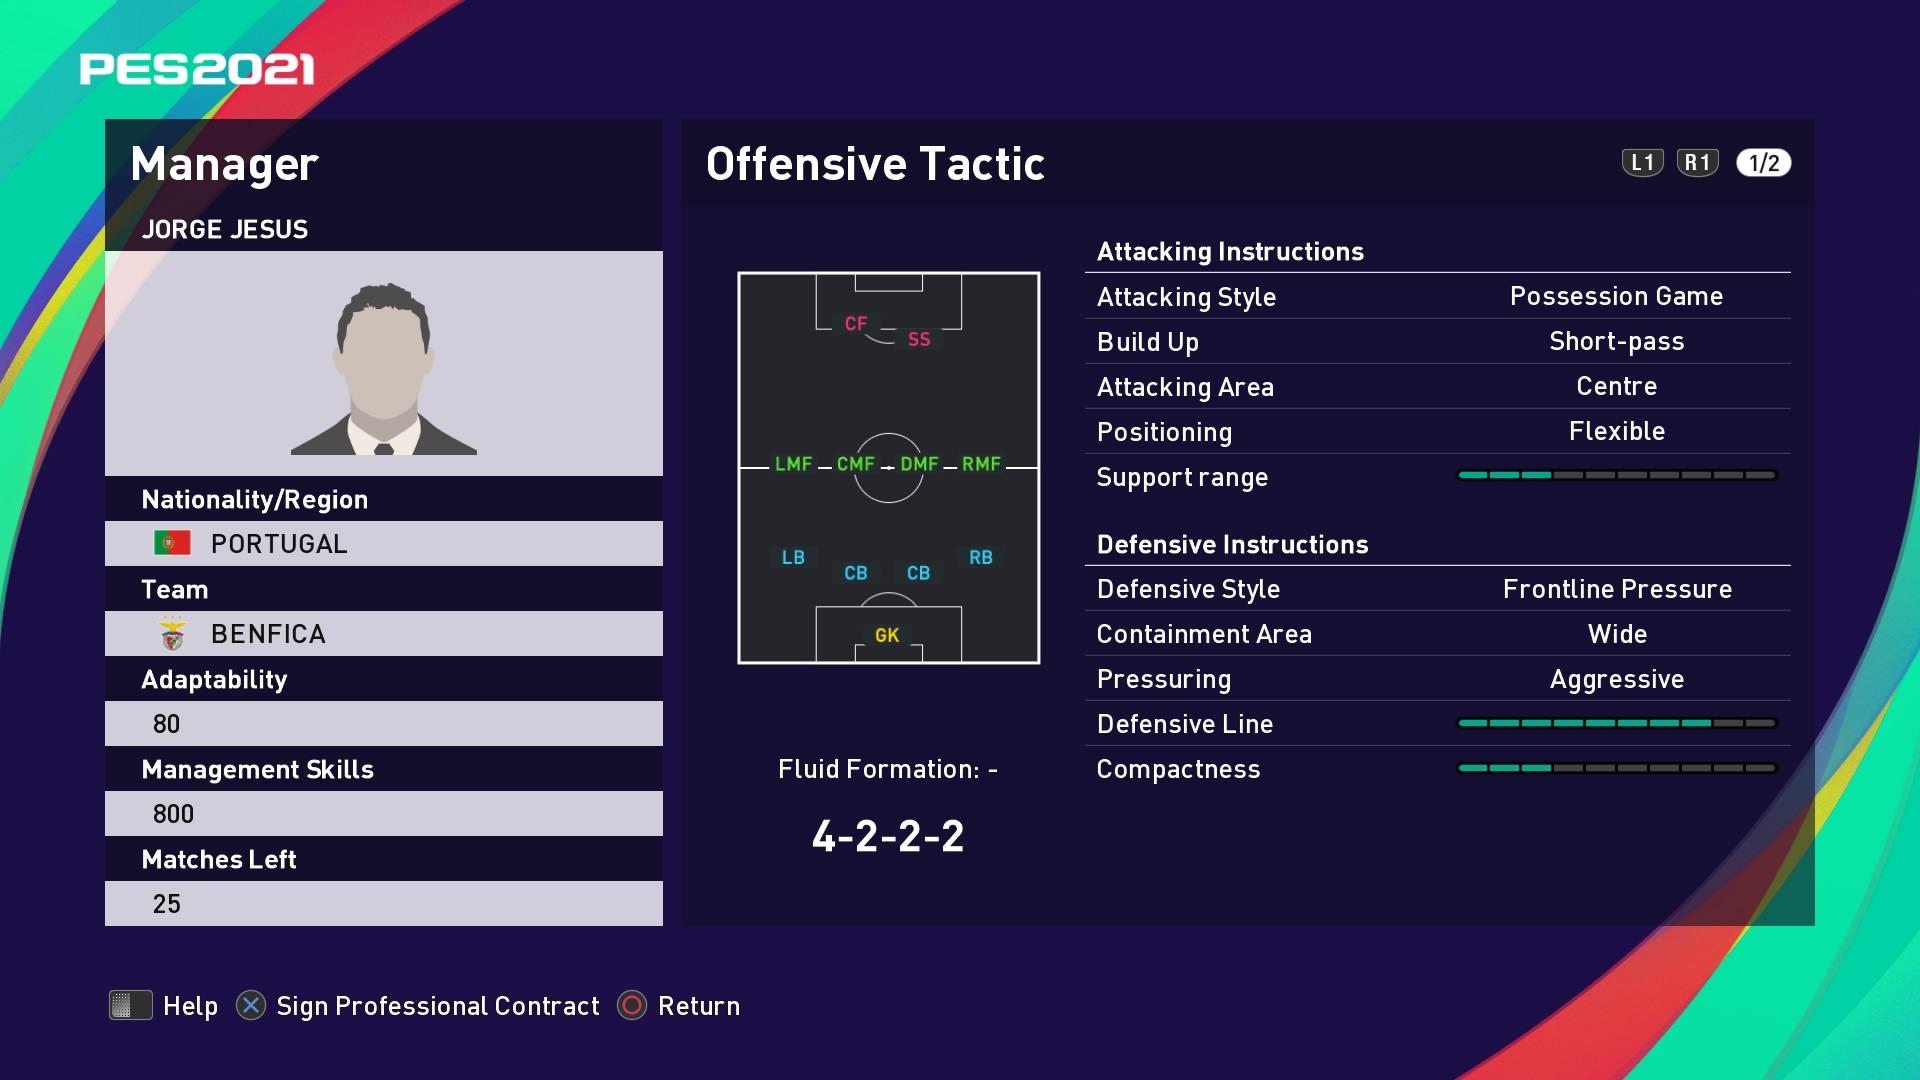 Jorge Jesus Offensive Tactic in PES 2021 myClub